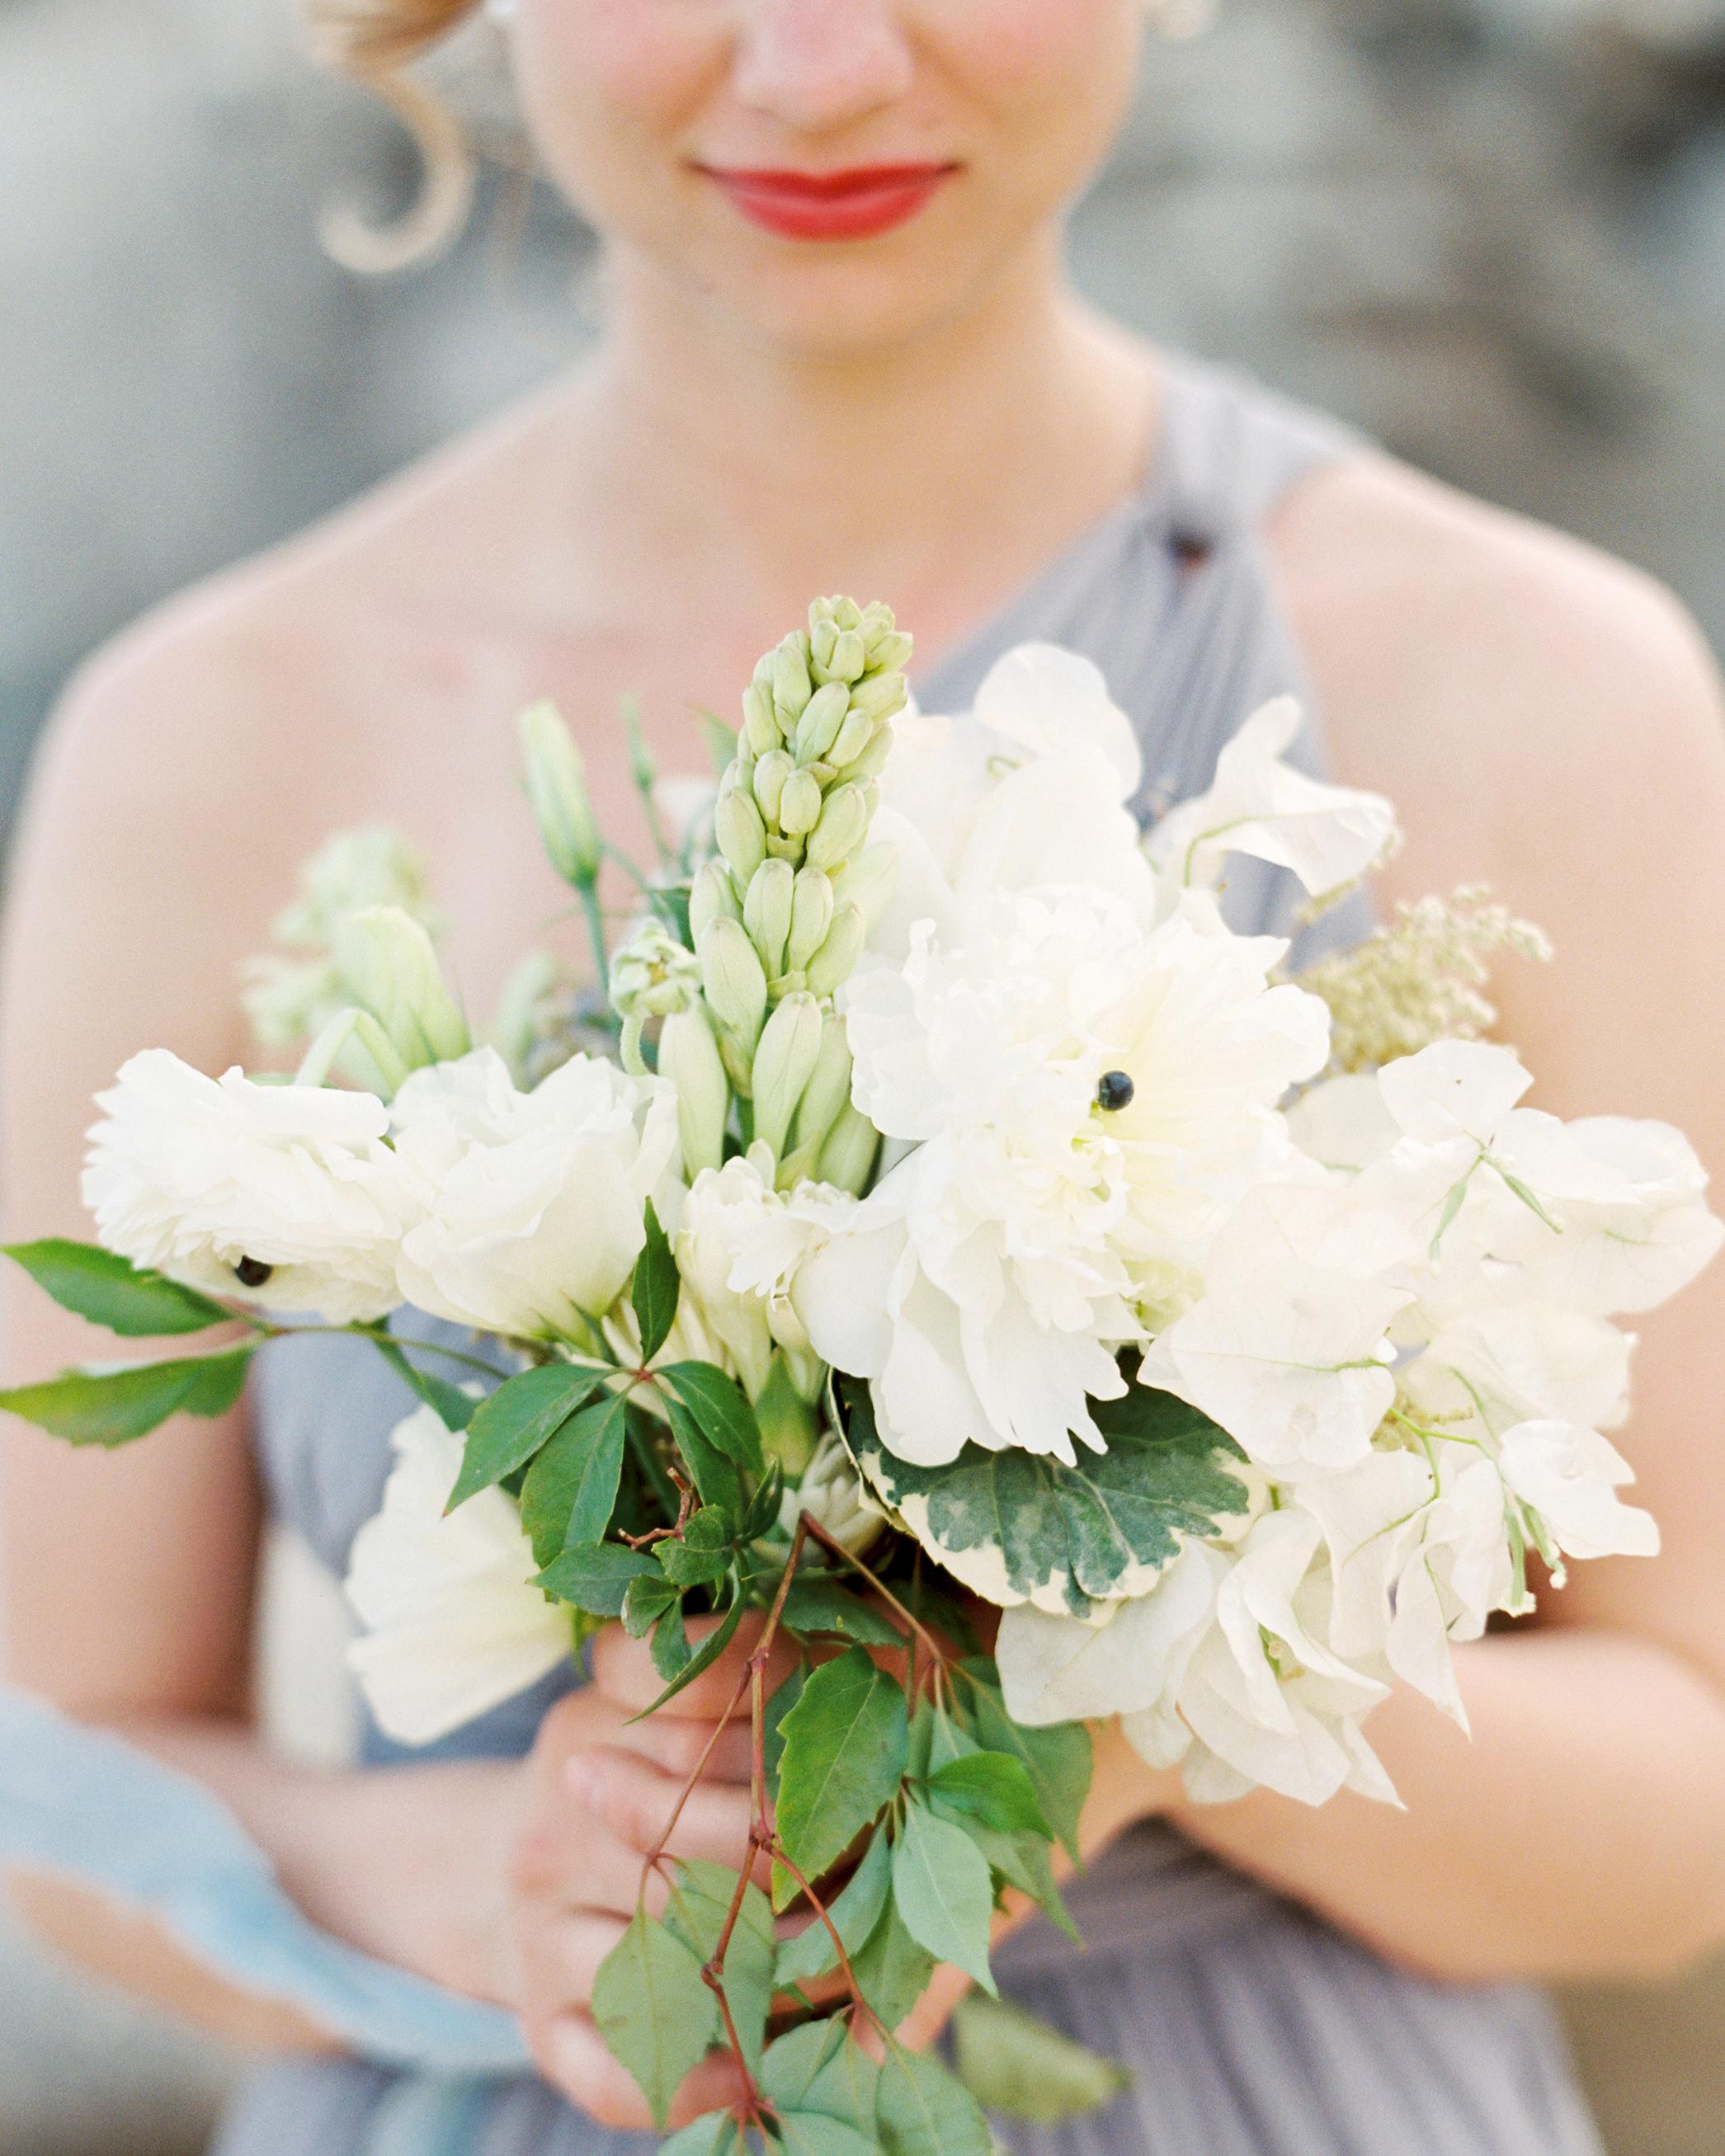 megan-jeremy-wedding-bouquet-30-s112680-0216.jpg